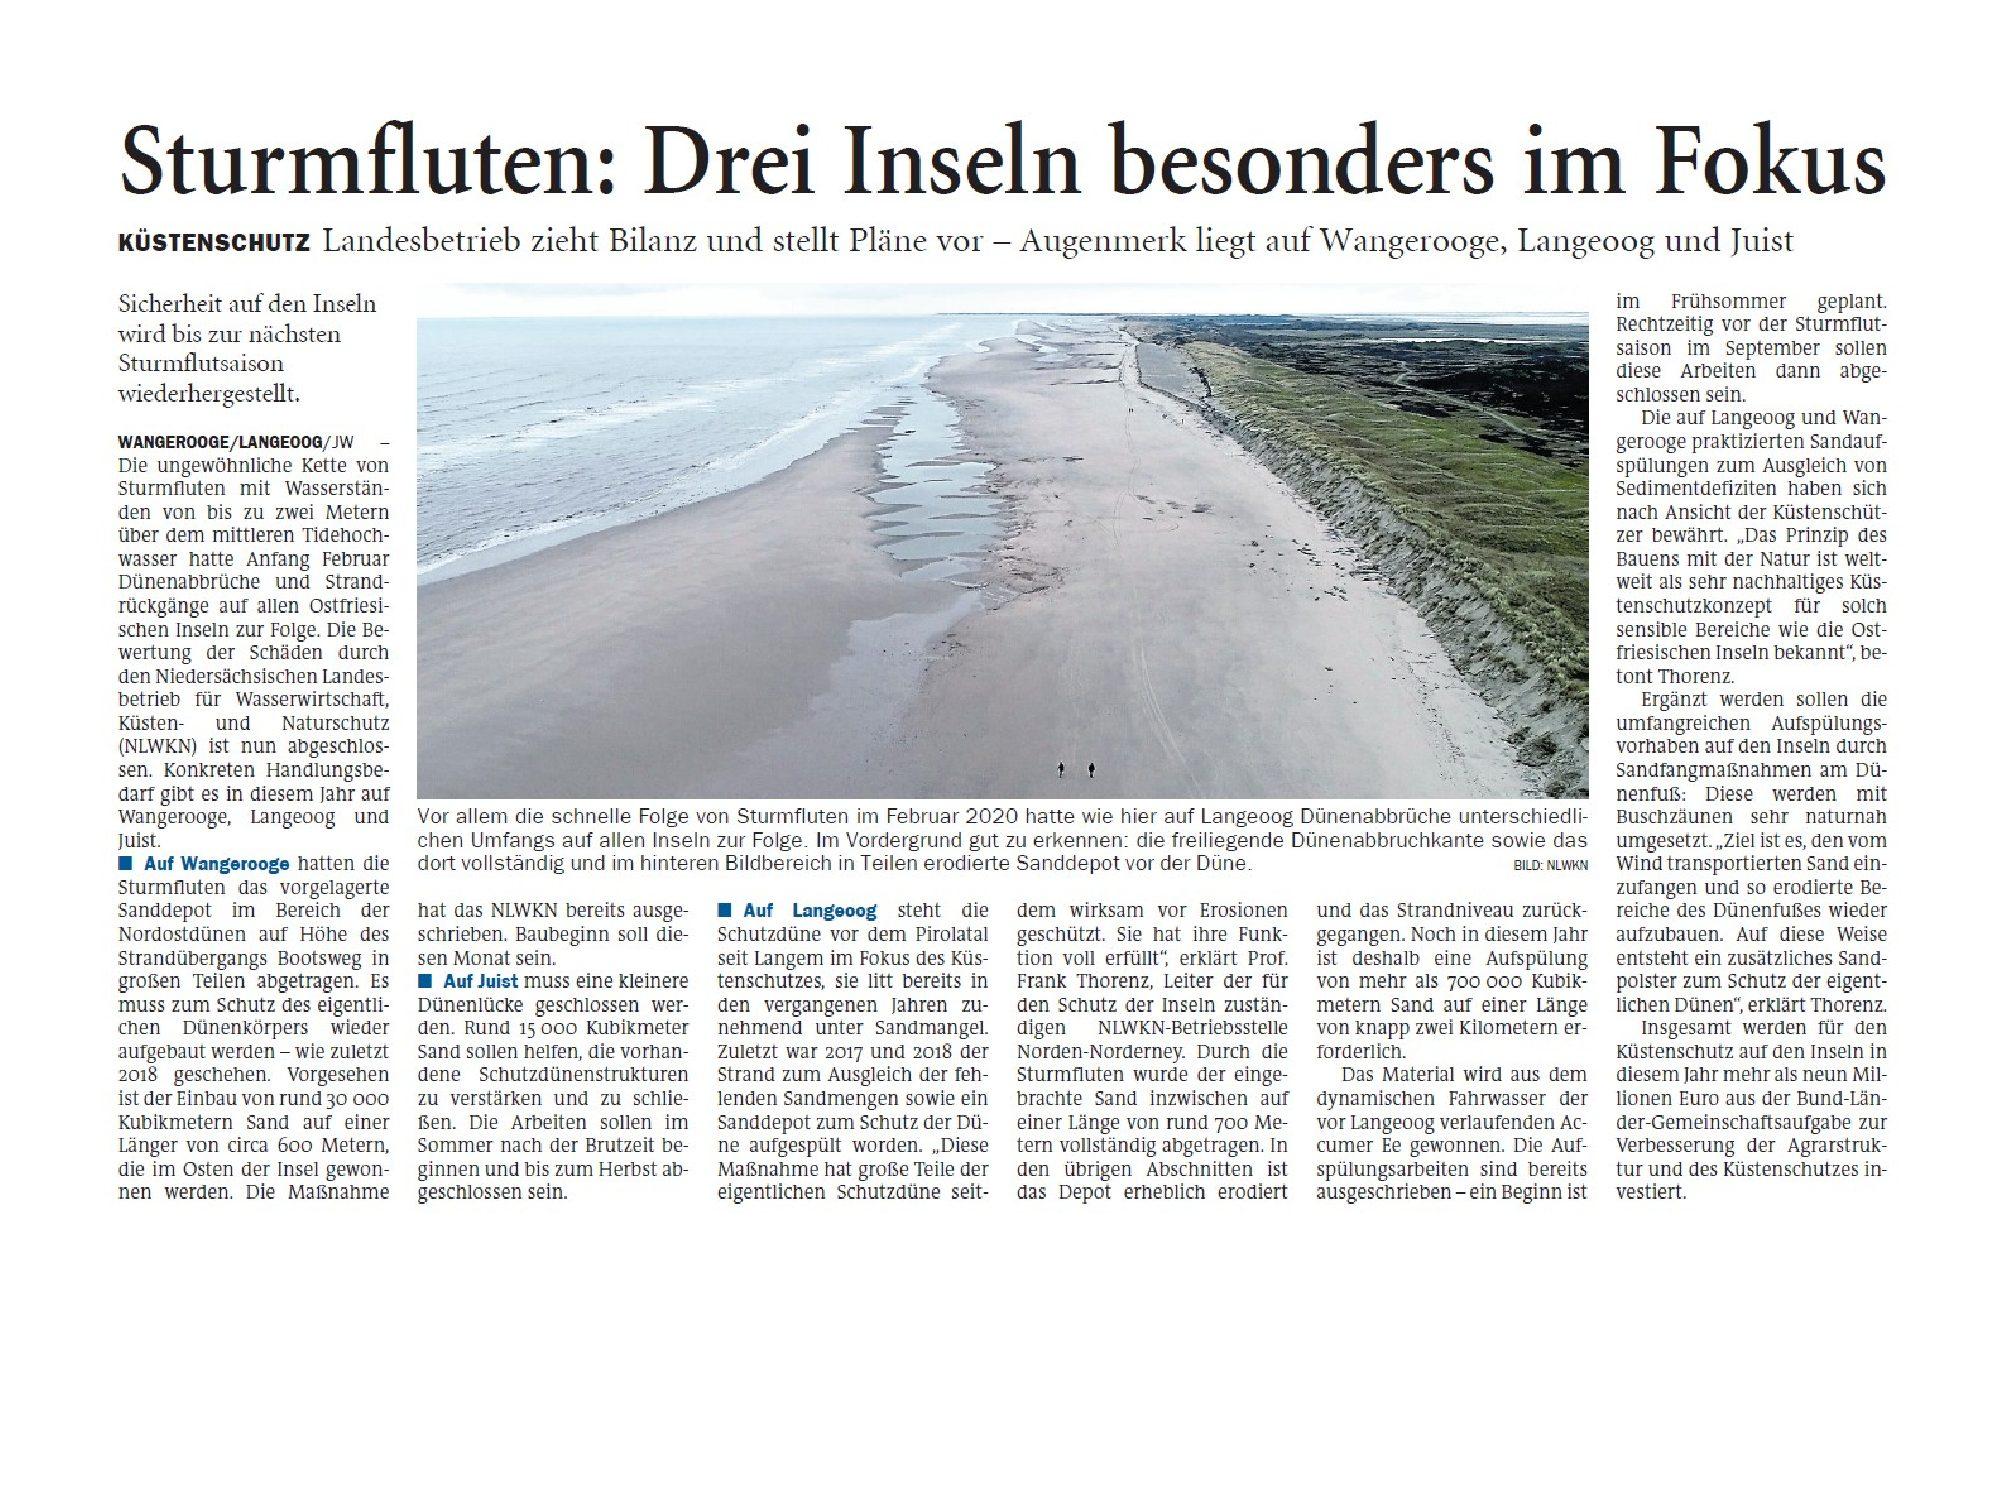 Jeversches Wochenblatt 02.05.2020 III